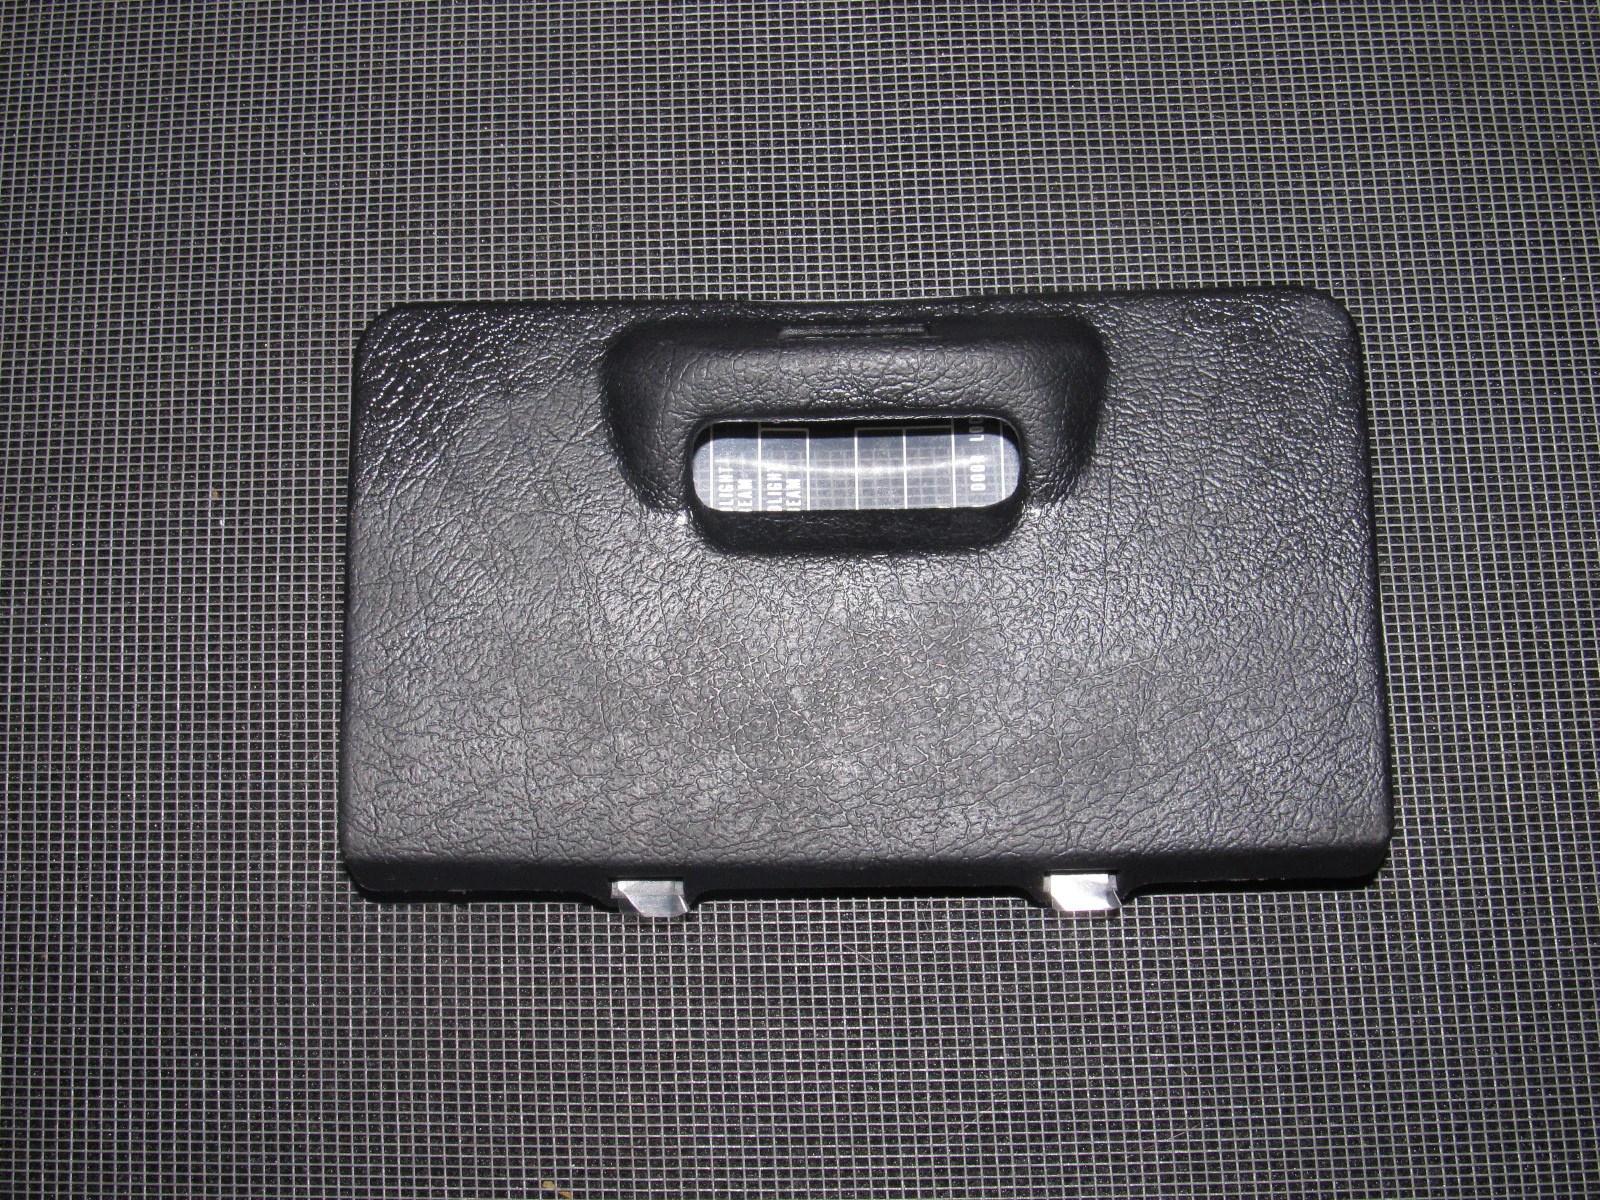 medium resolution of  honda del sol oem interior fuse box cover product image